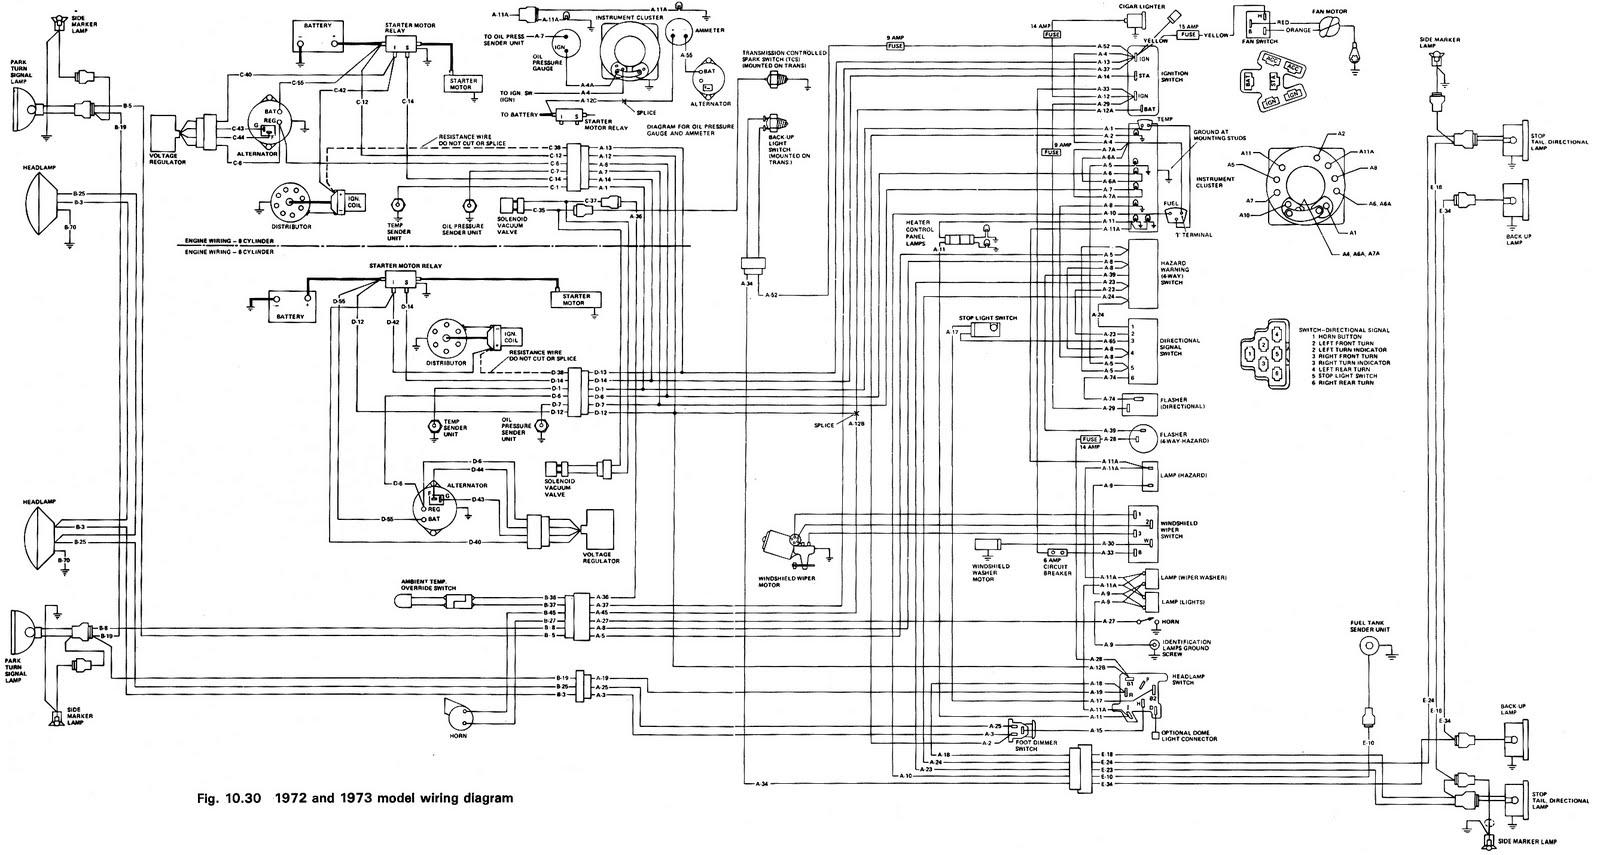 MS_2399] Autocar Wiring Diagram Autocar Circuit DiagramsMinaga Subd Ropye Hete Inama Mohammedshrine Librar Wiring 101